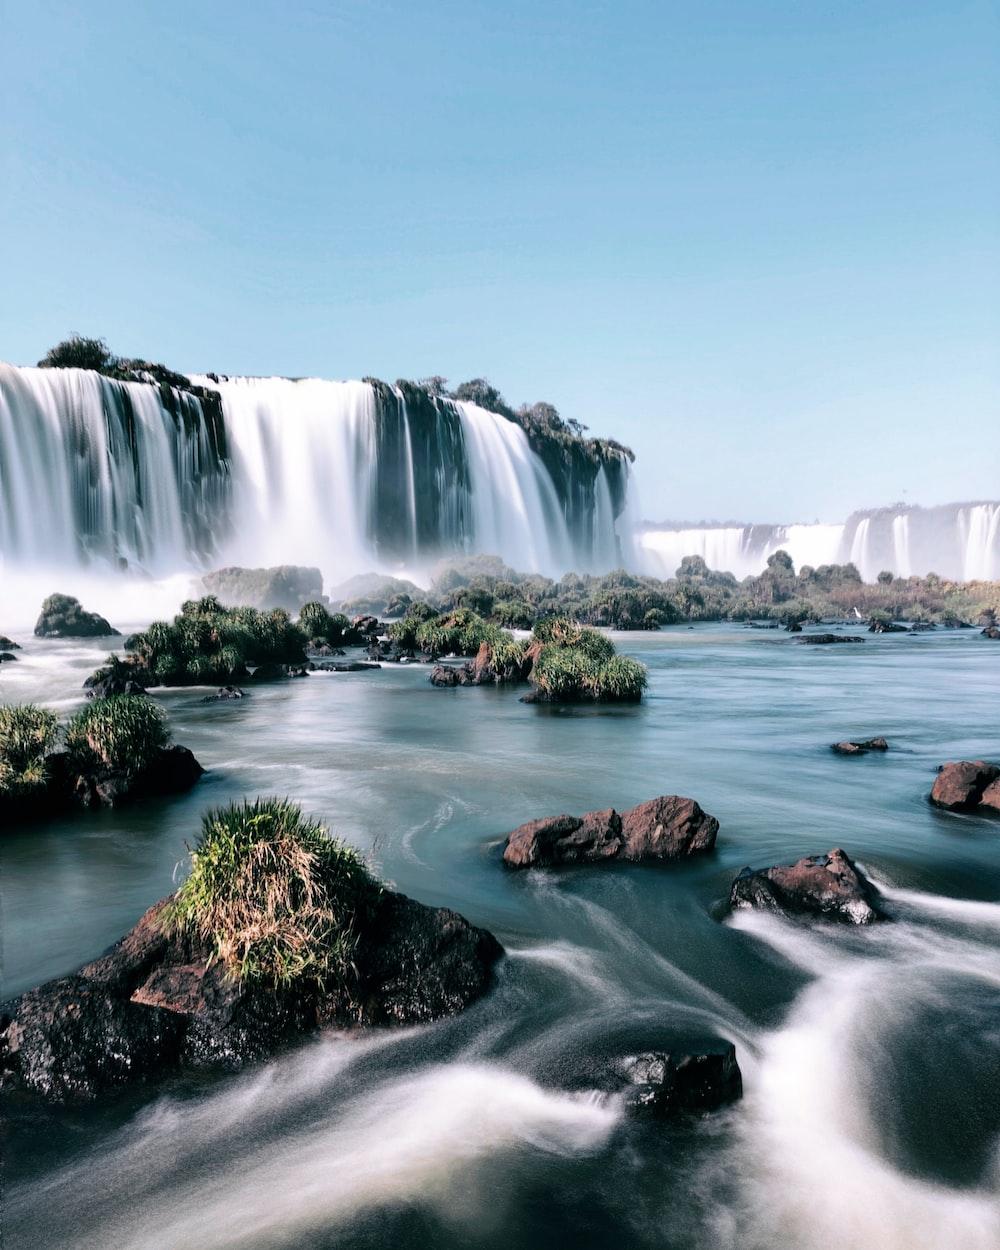 waterfalls under clear sky during daytime digital wallpaper